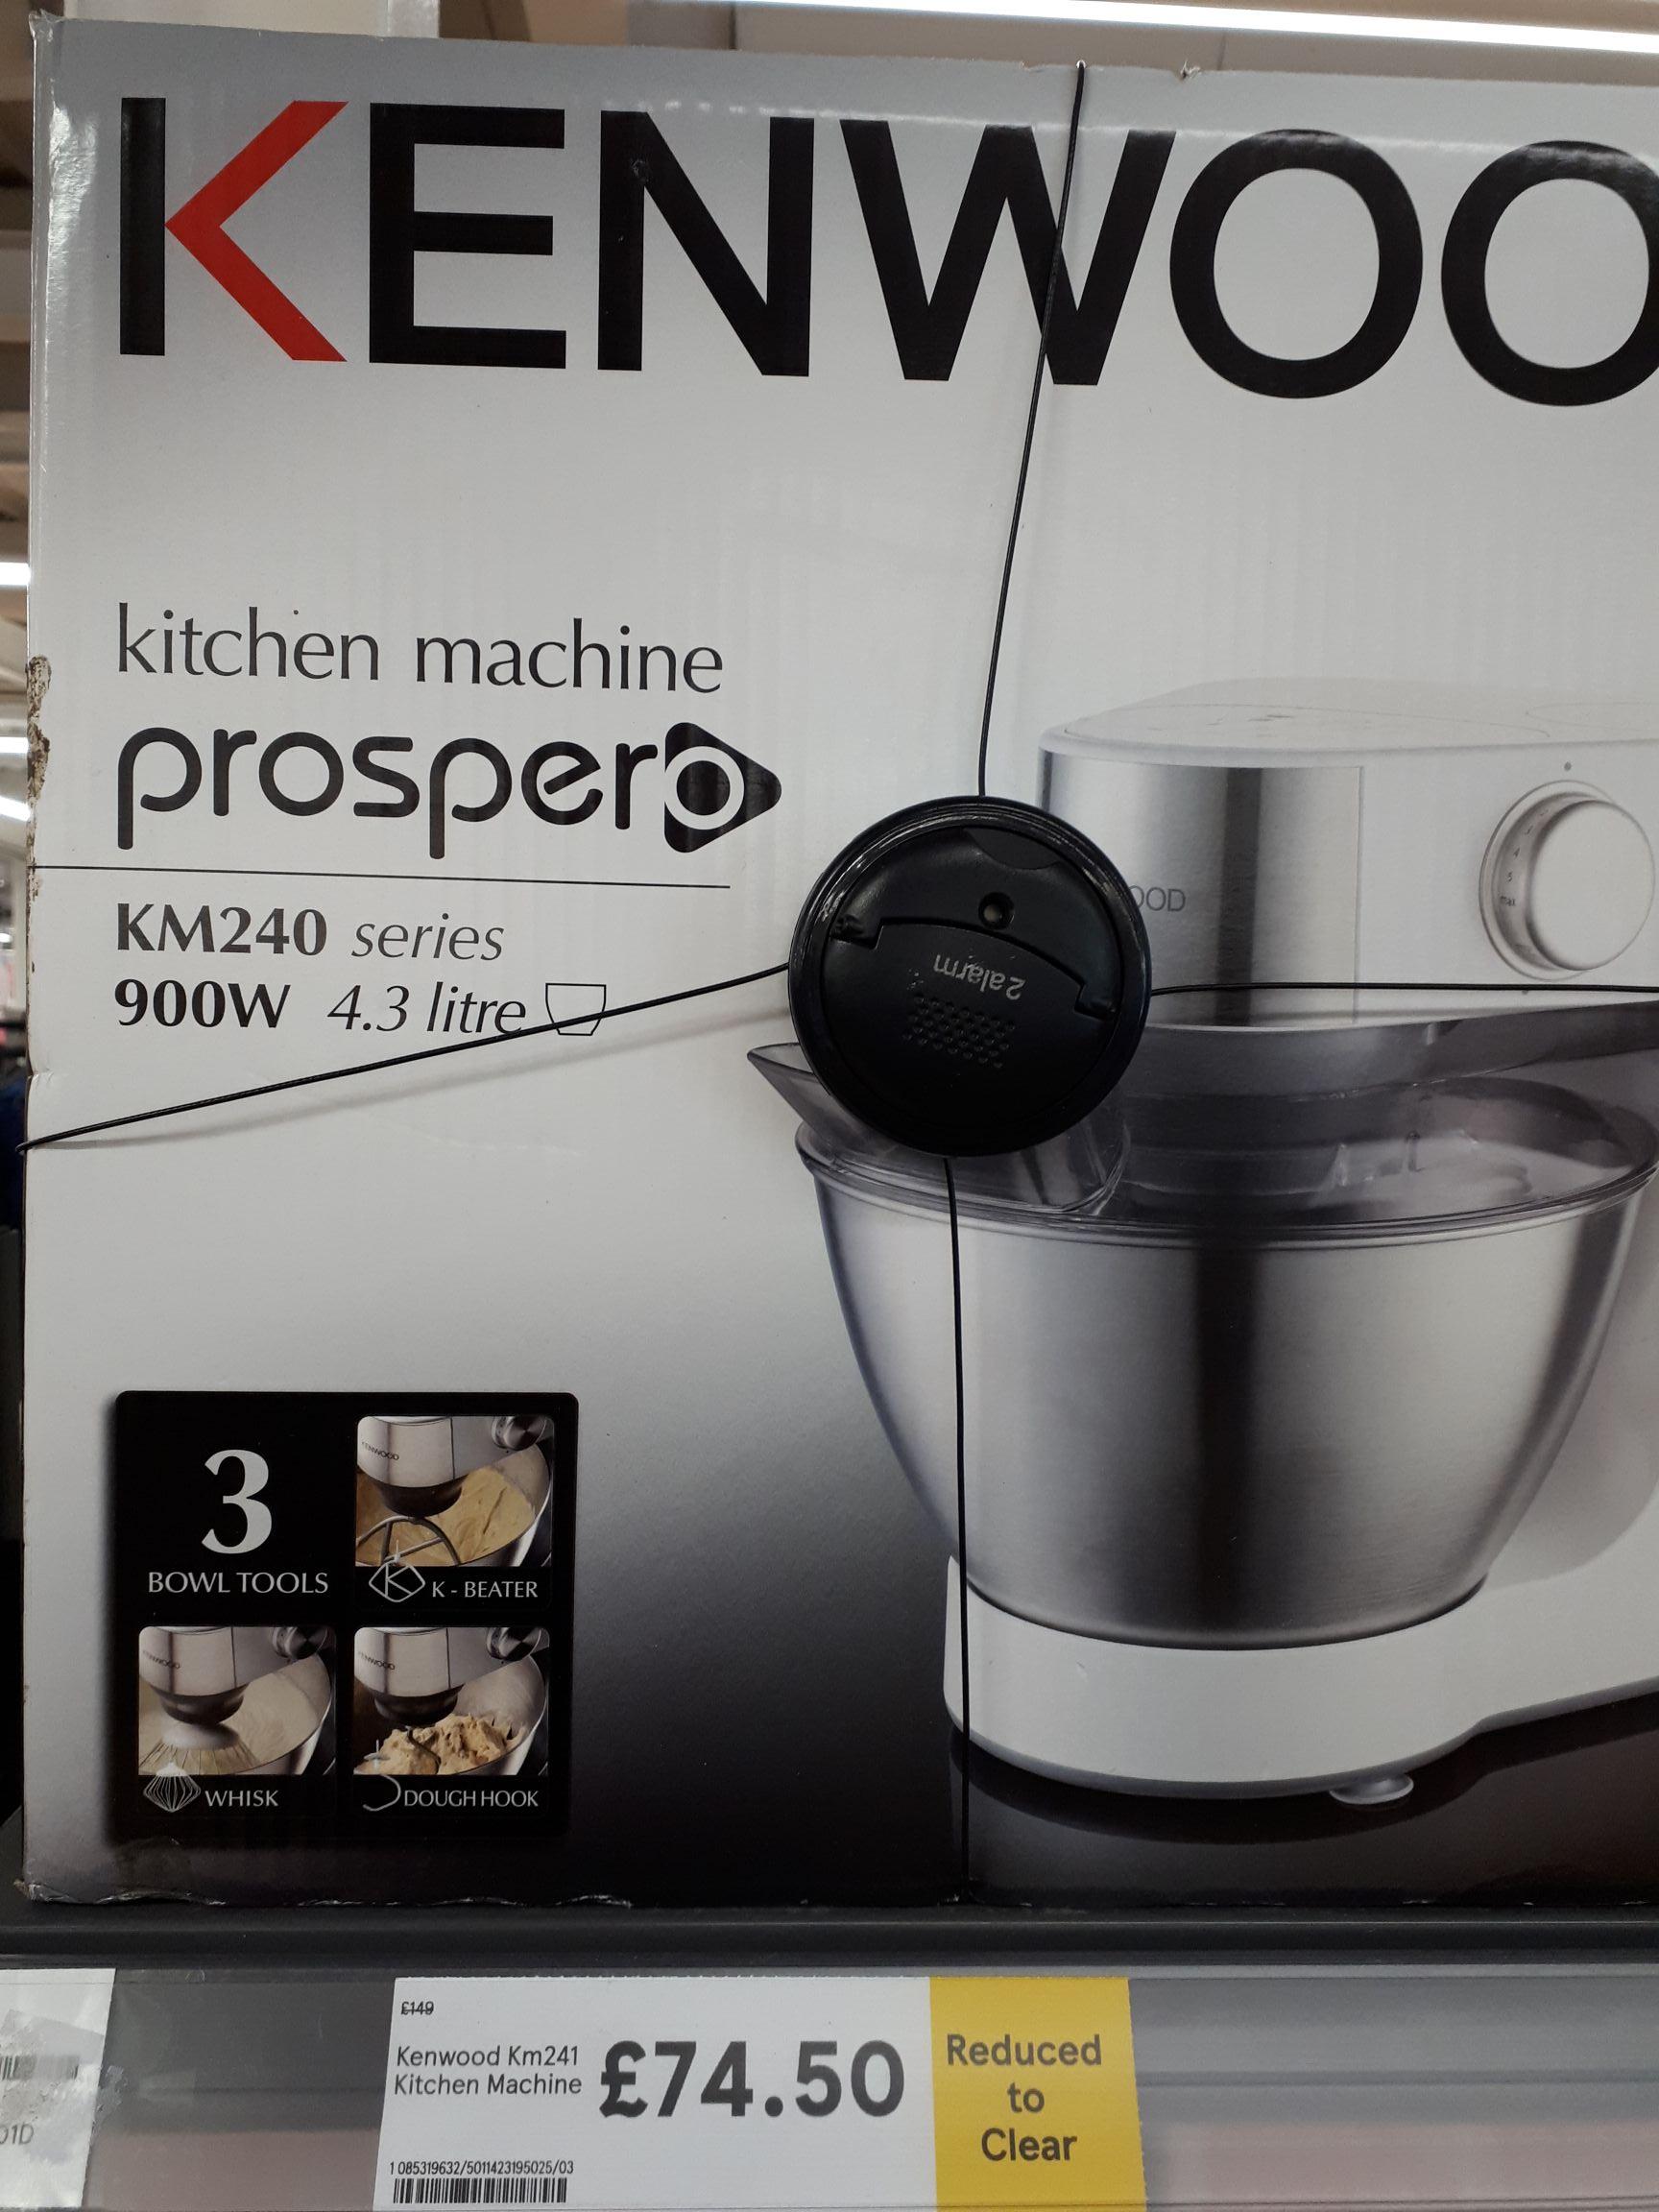 Kenwood Prospero kitchen machine £74.50 in-store @ Tesco (Romford)